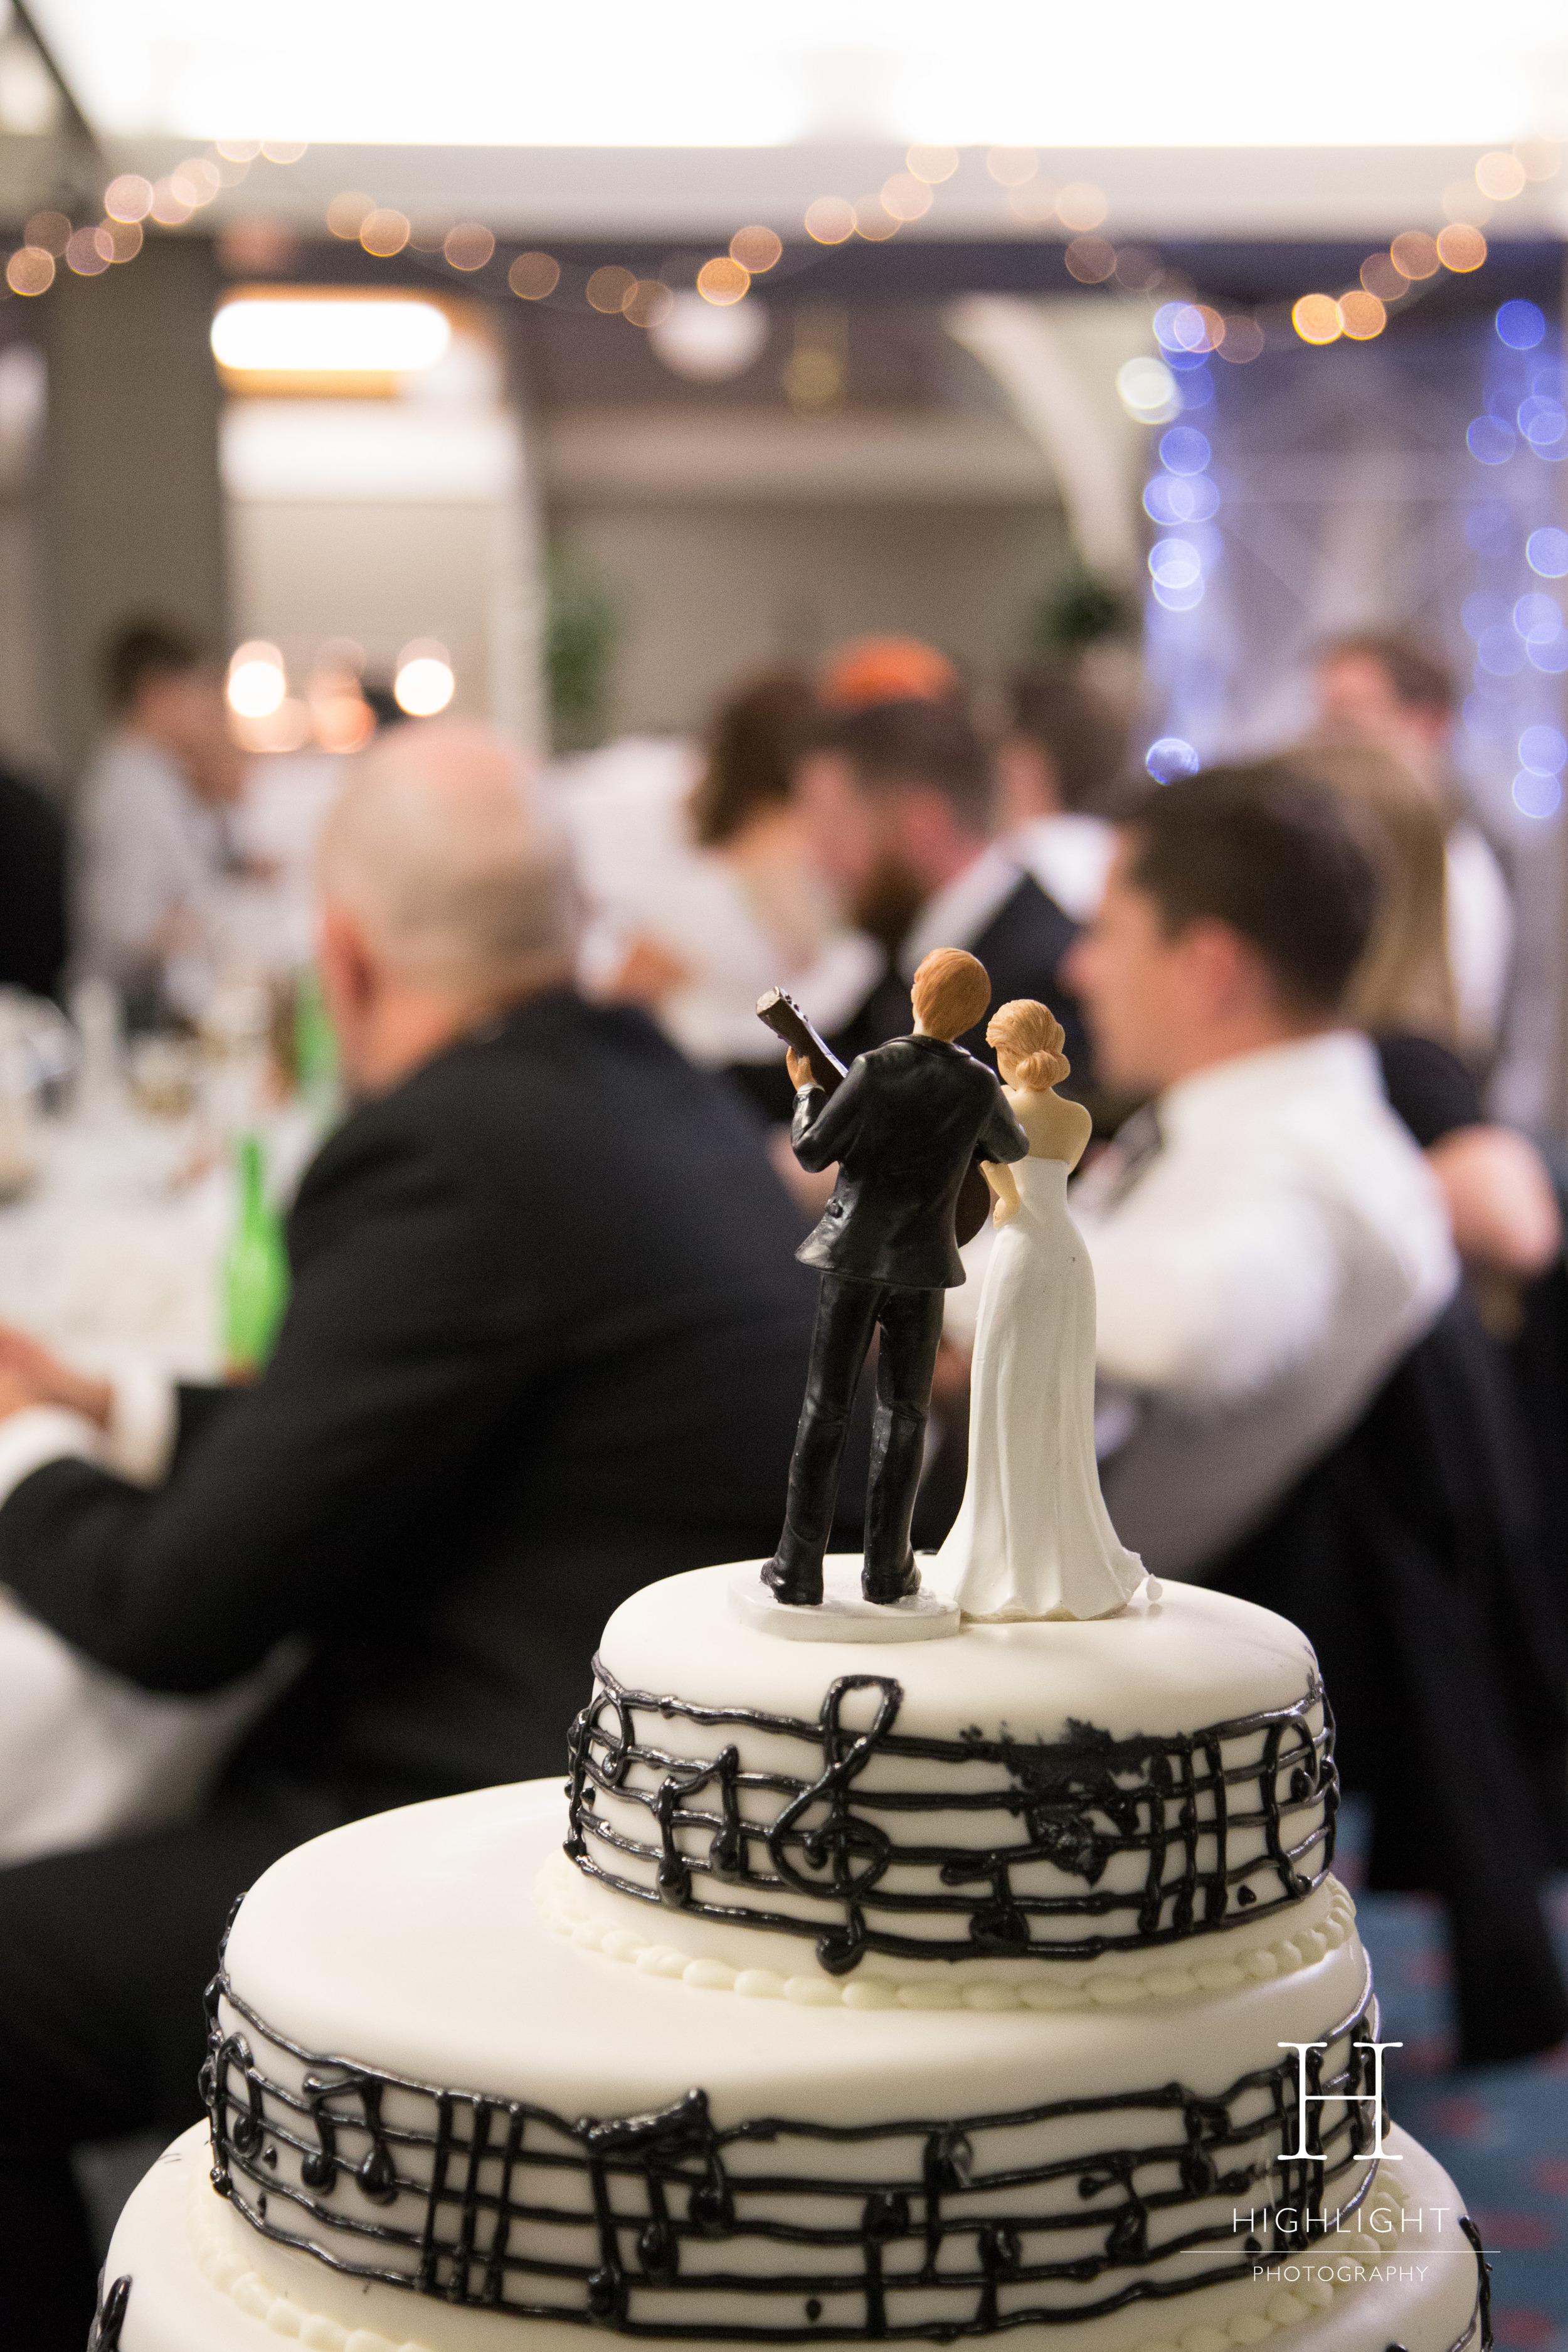 highlight-wedding-photography-palmerston-north-copthorne-cake.jpg